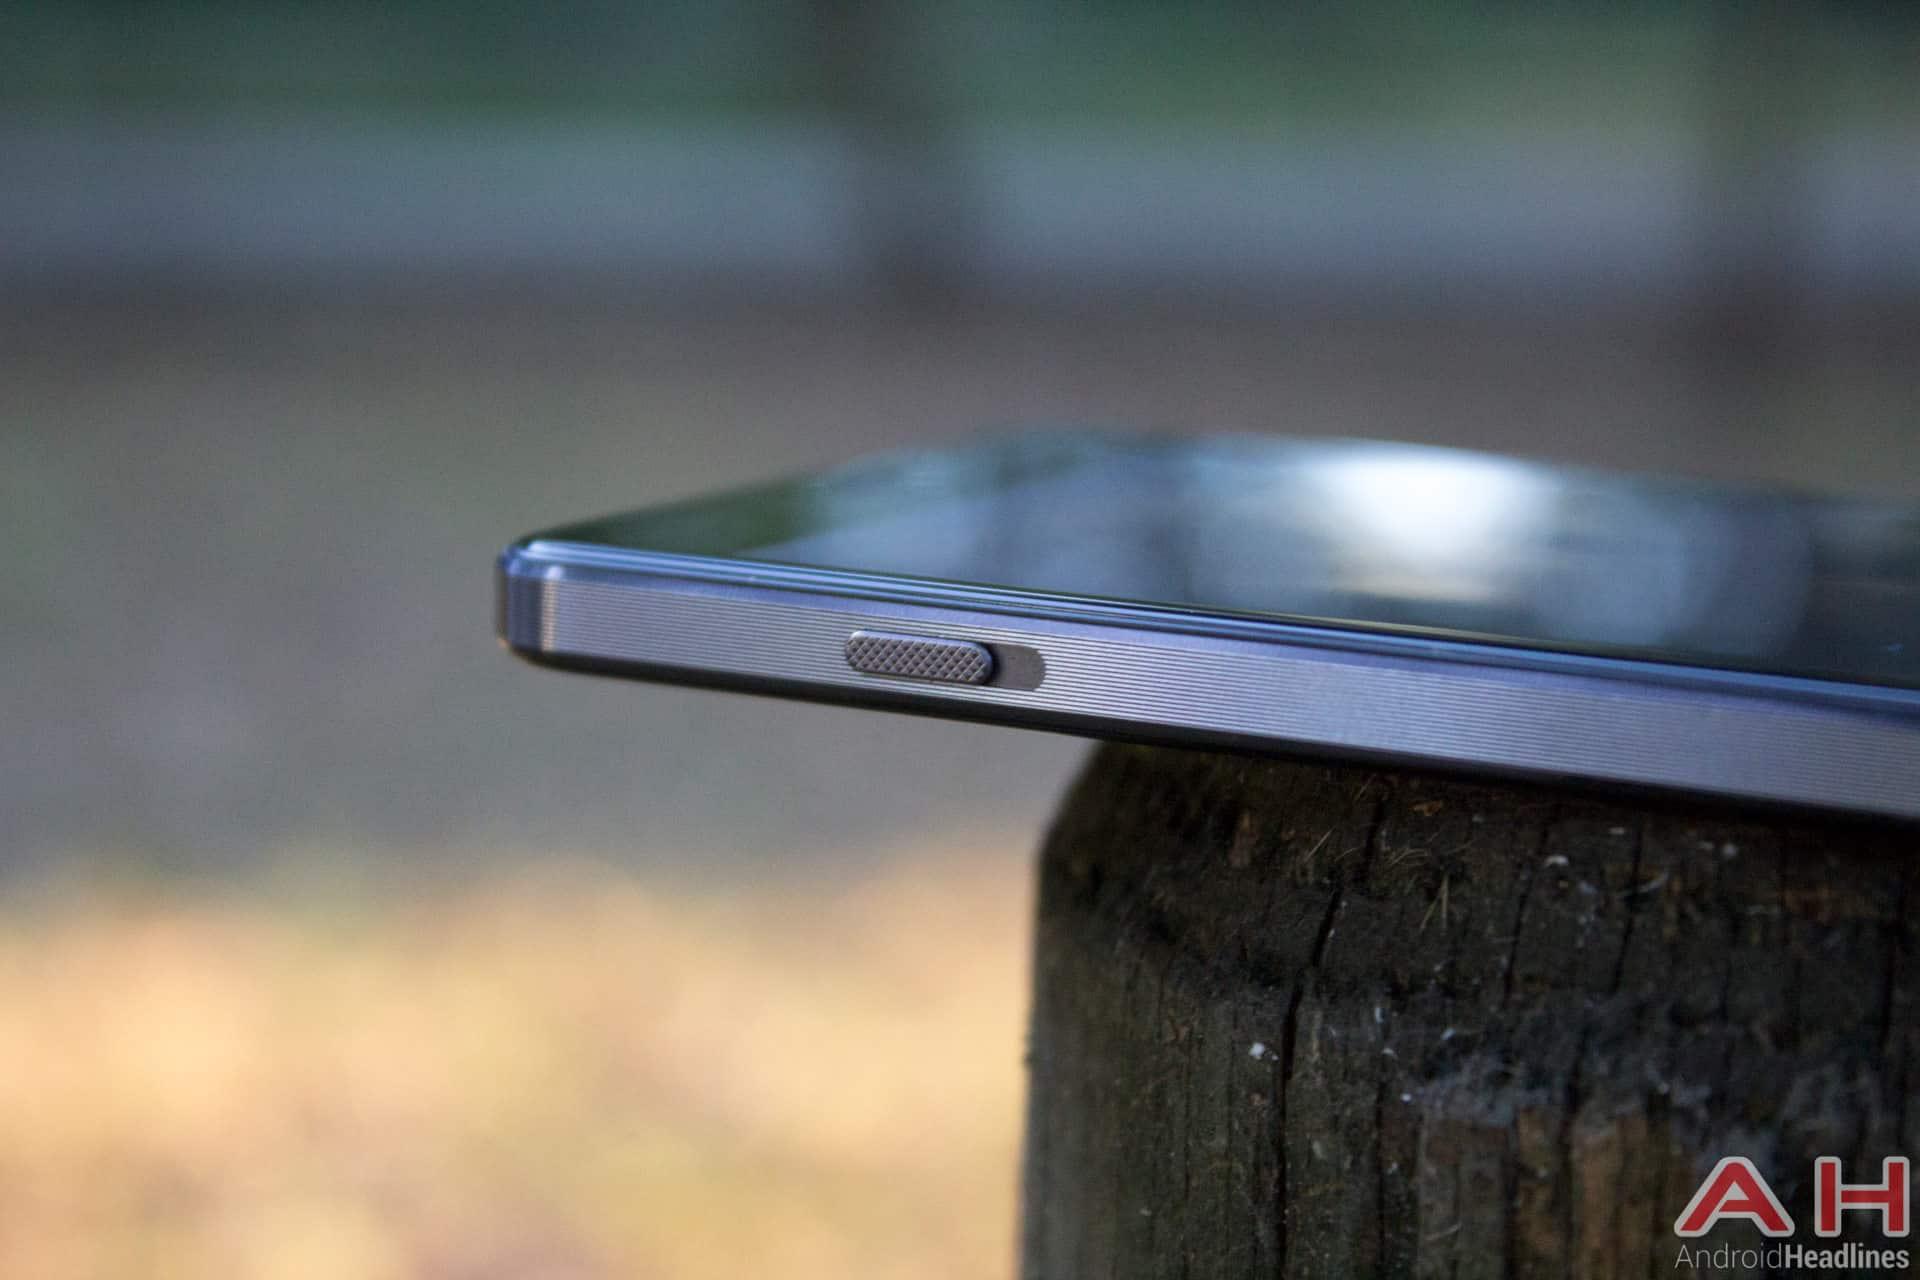 OnePlus X AH priority none